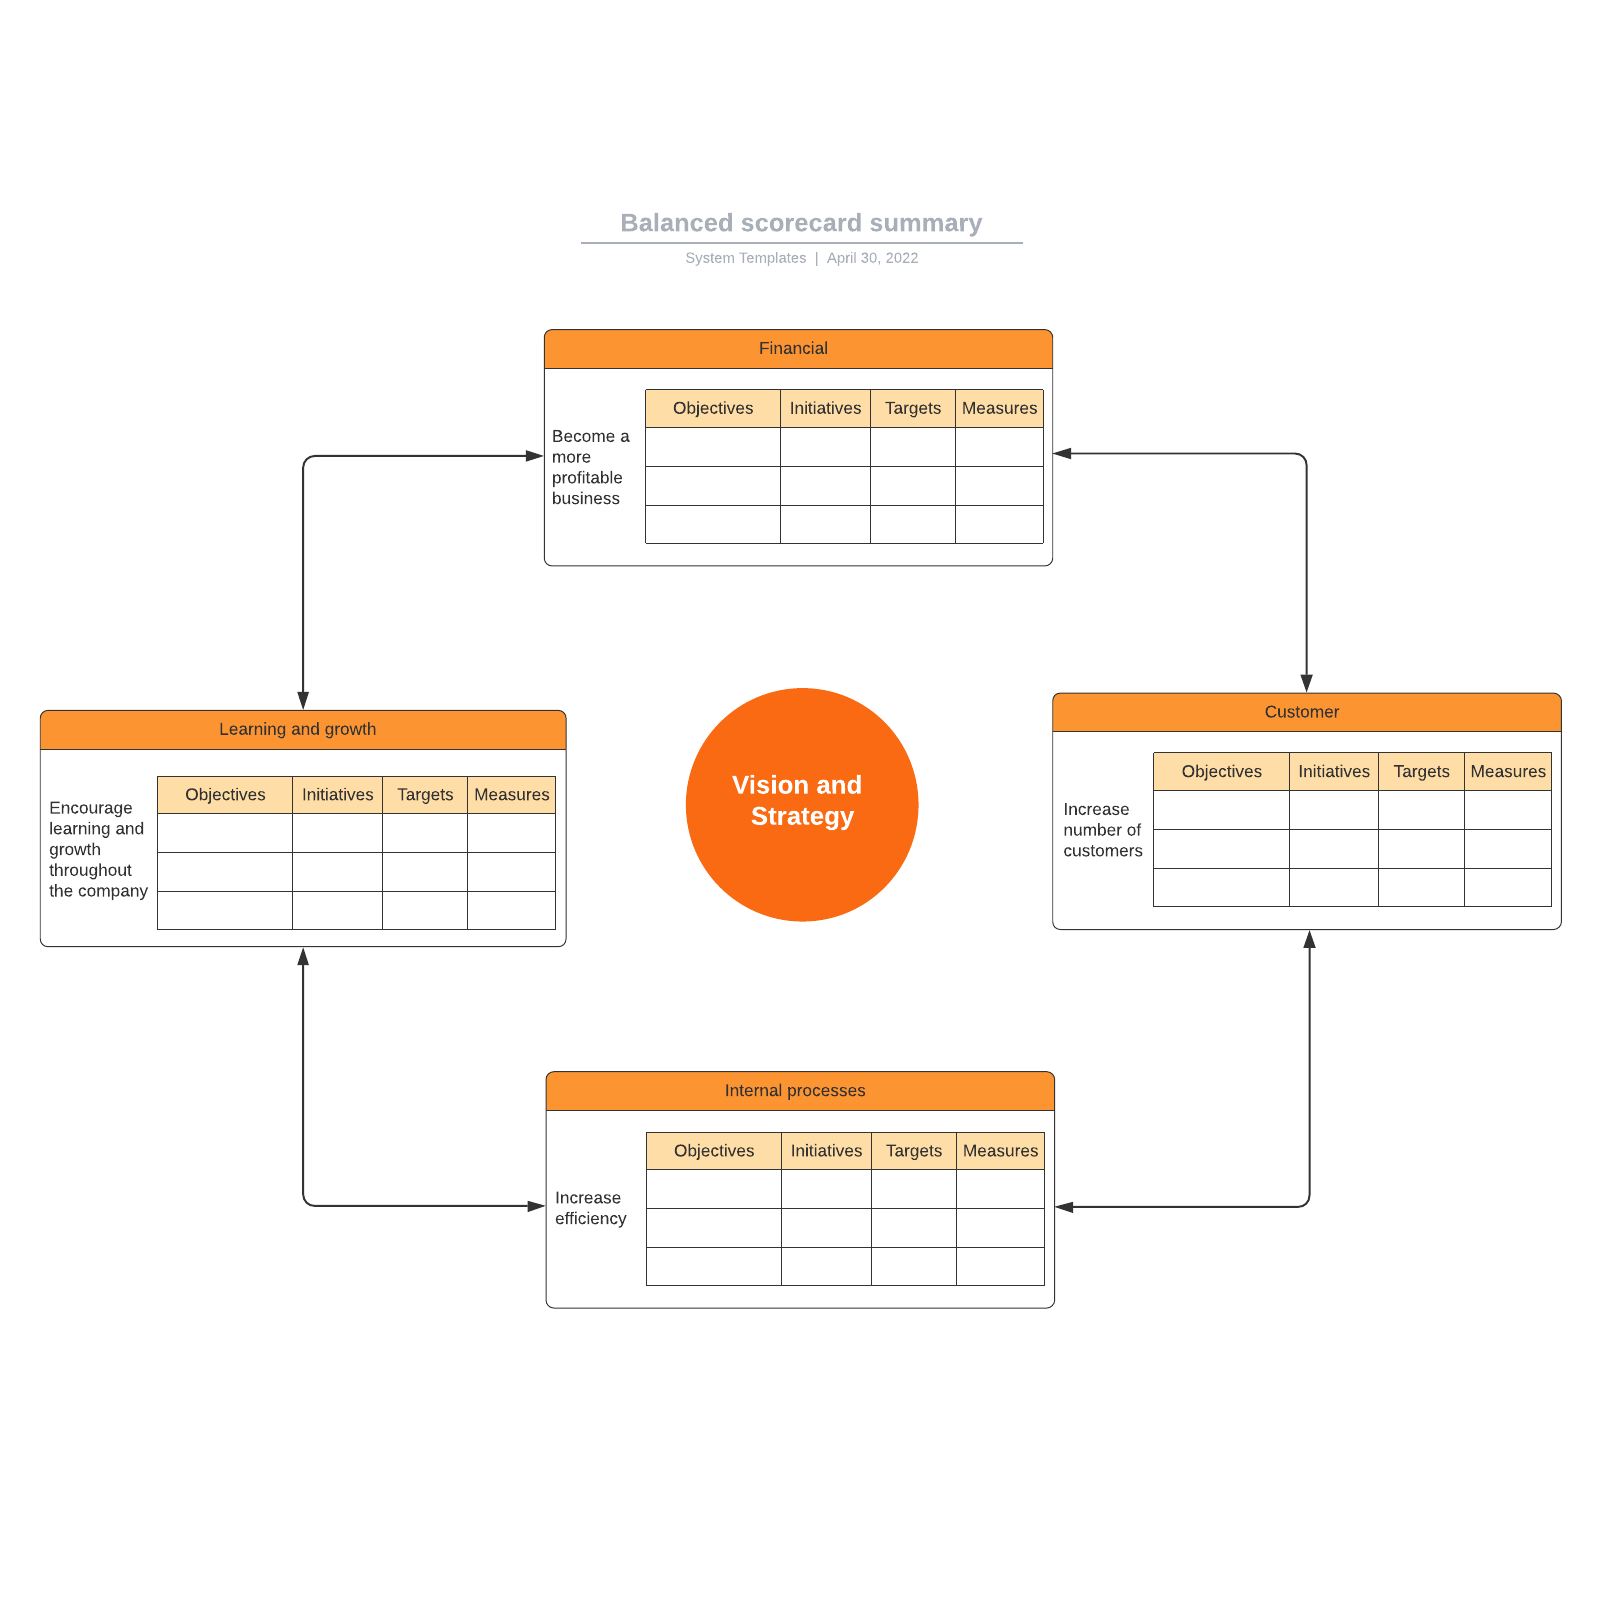 Balanced scorecard summary